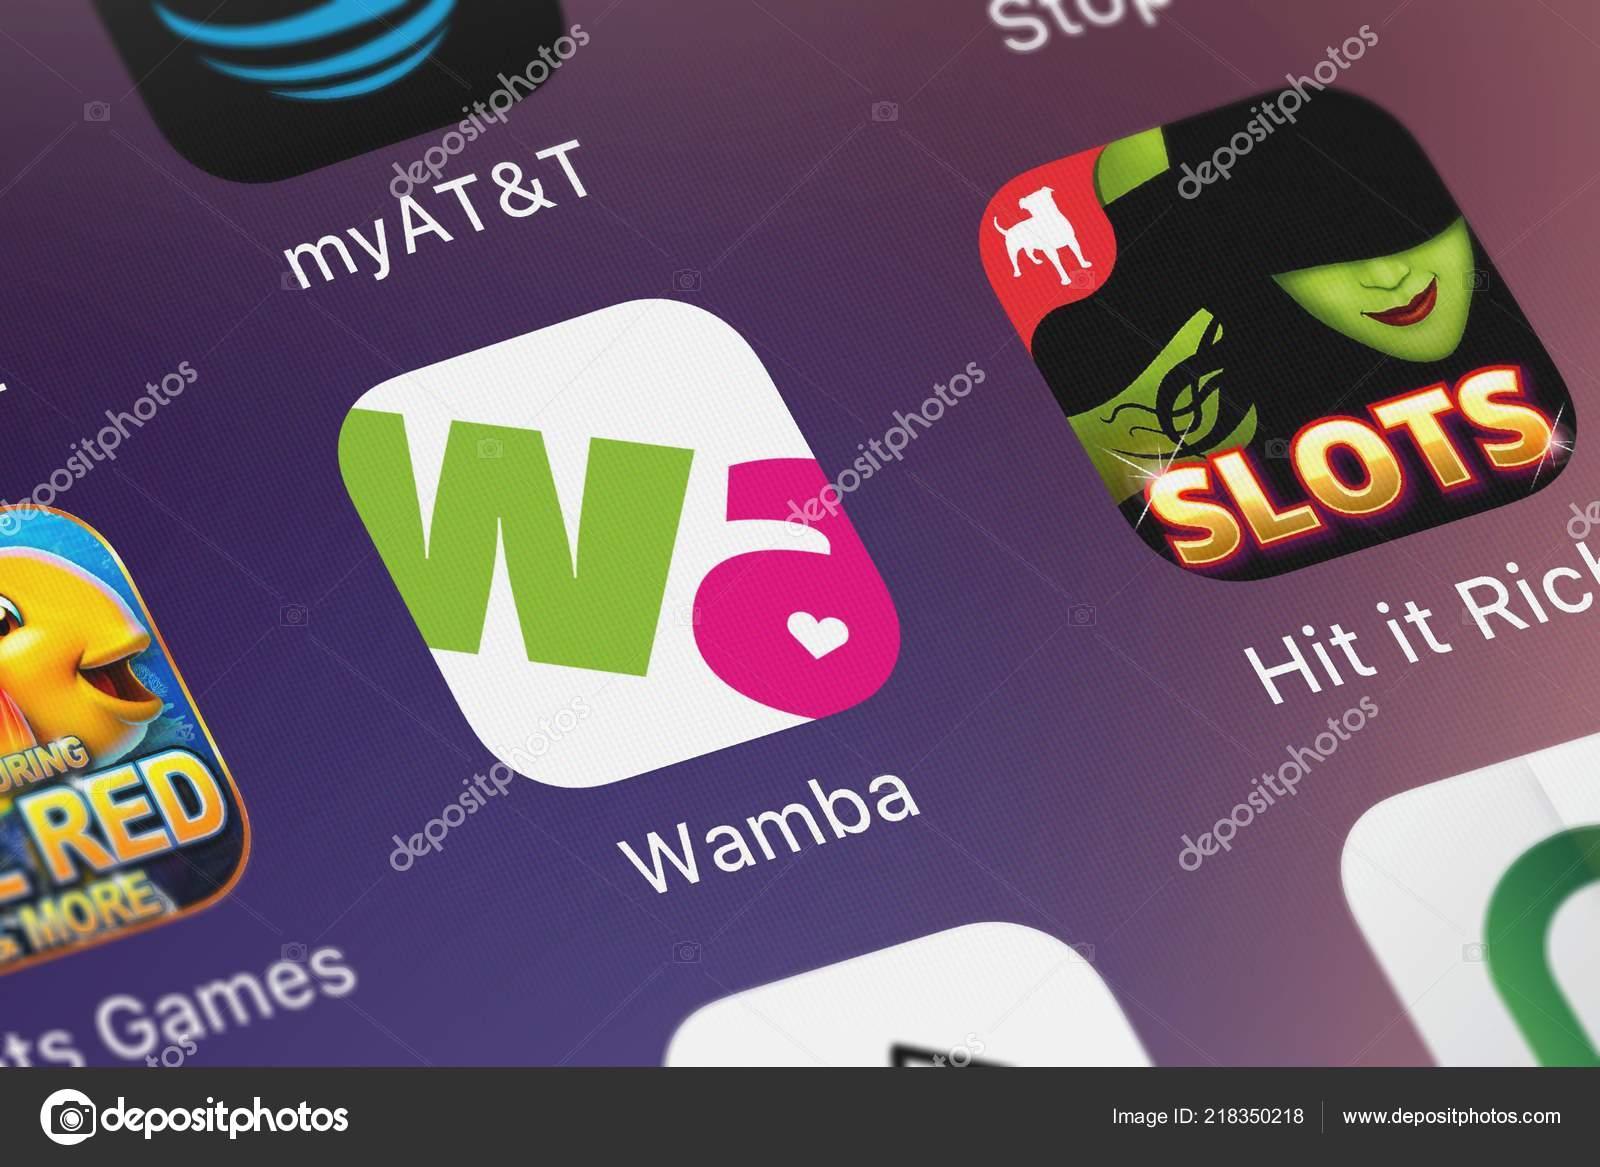 wamba app